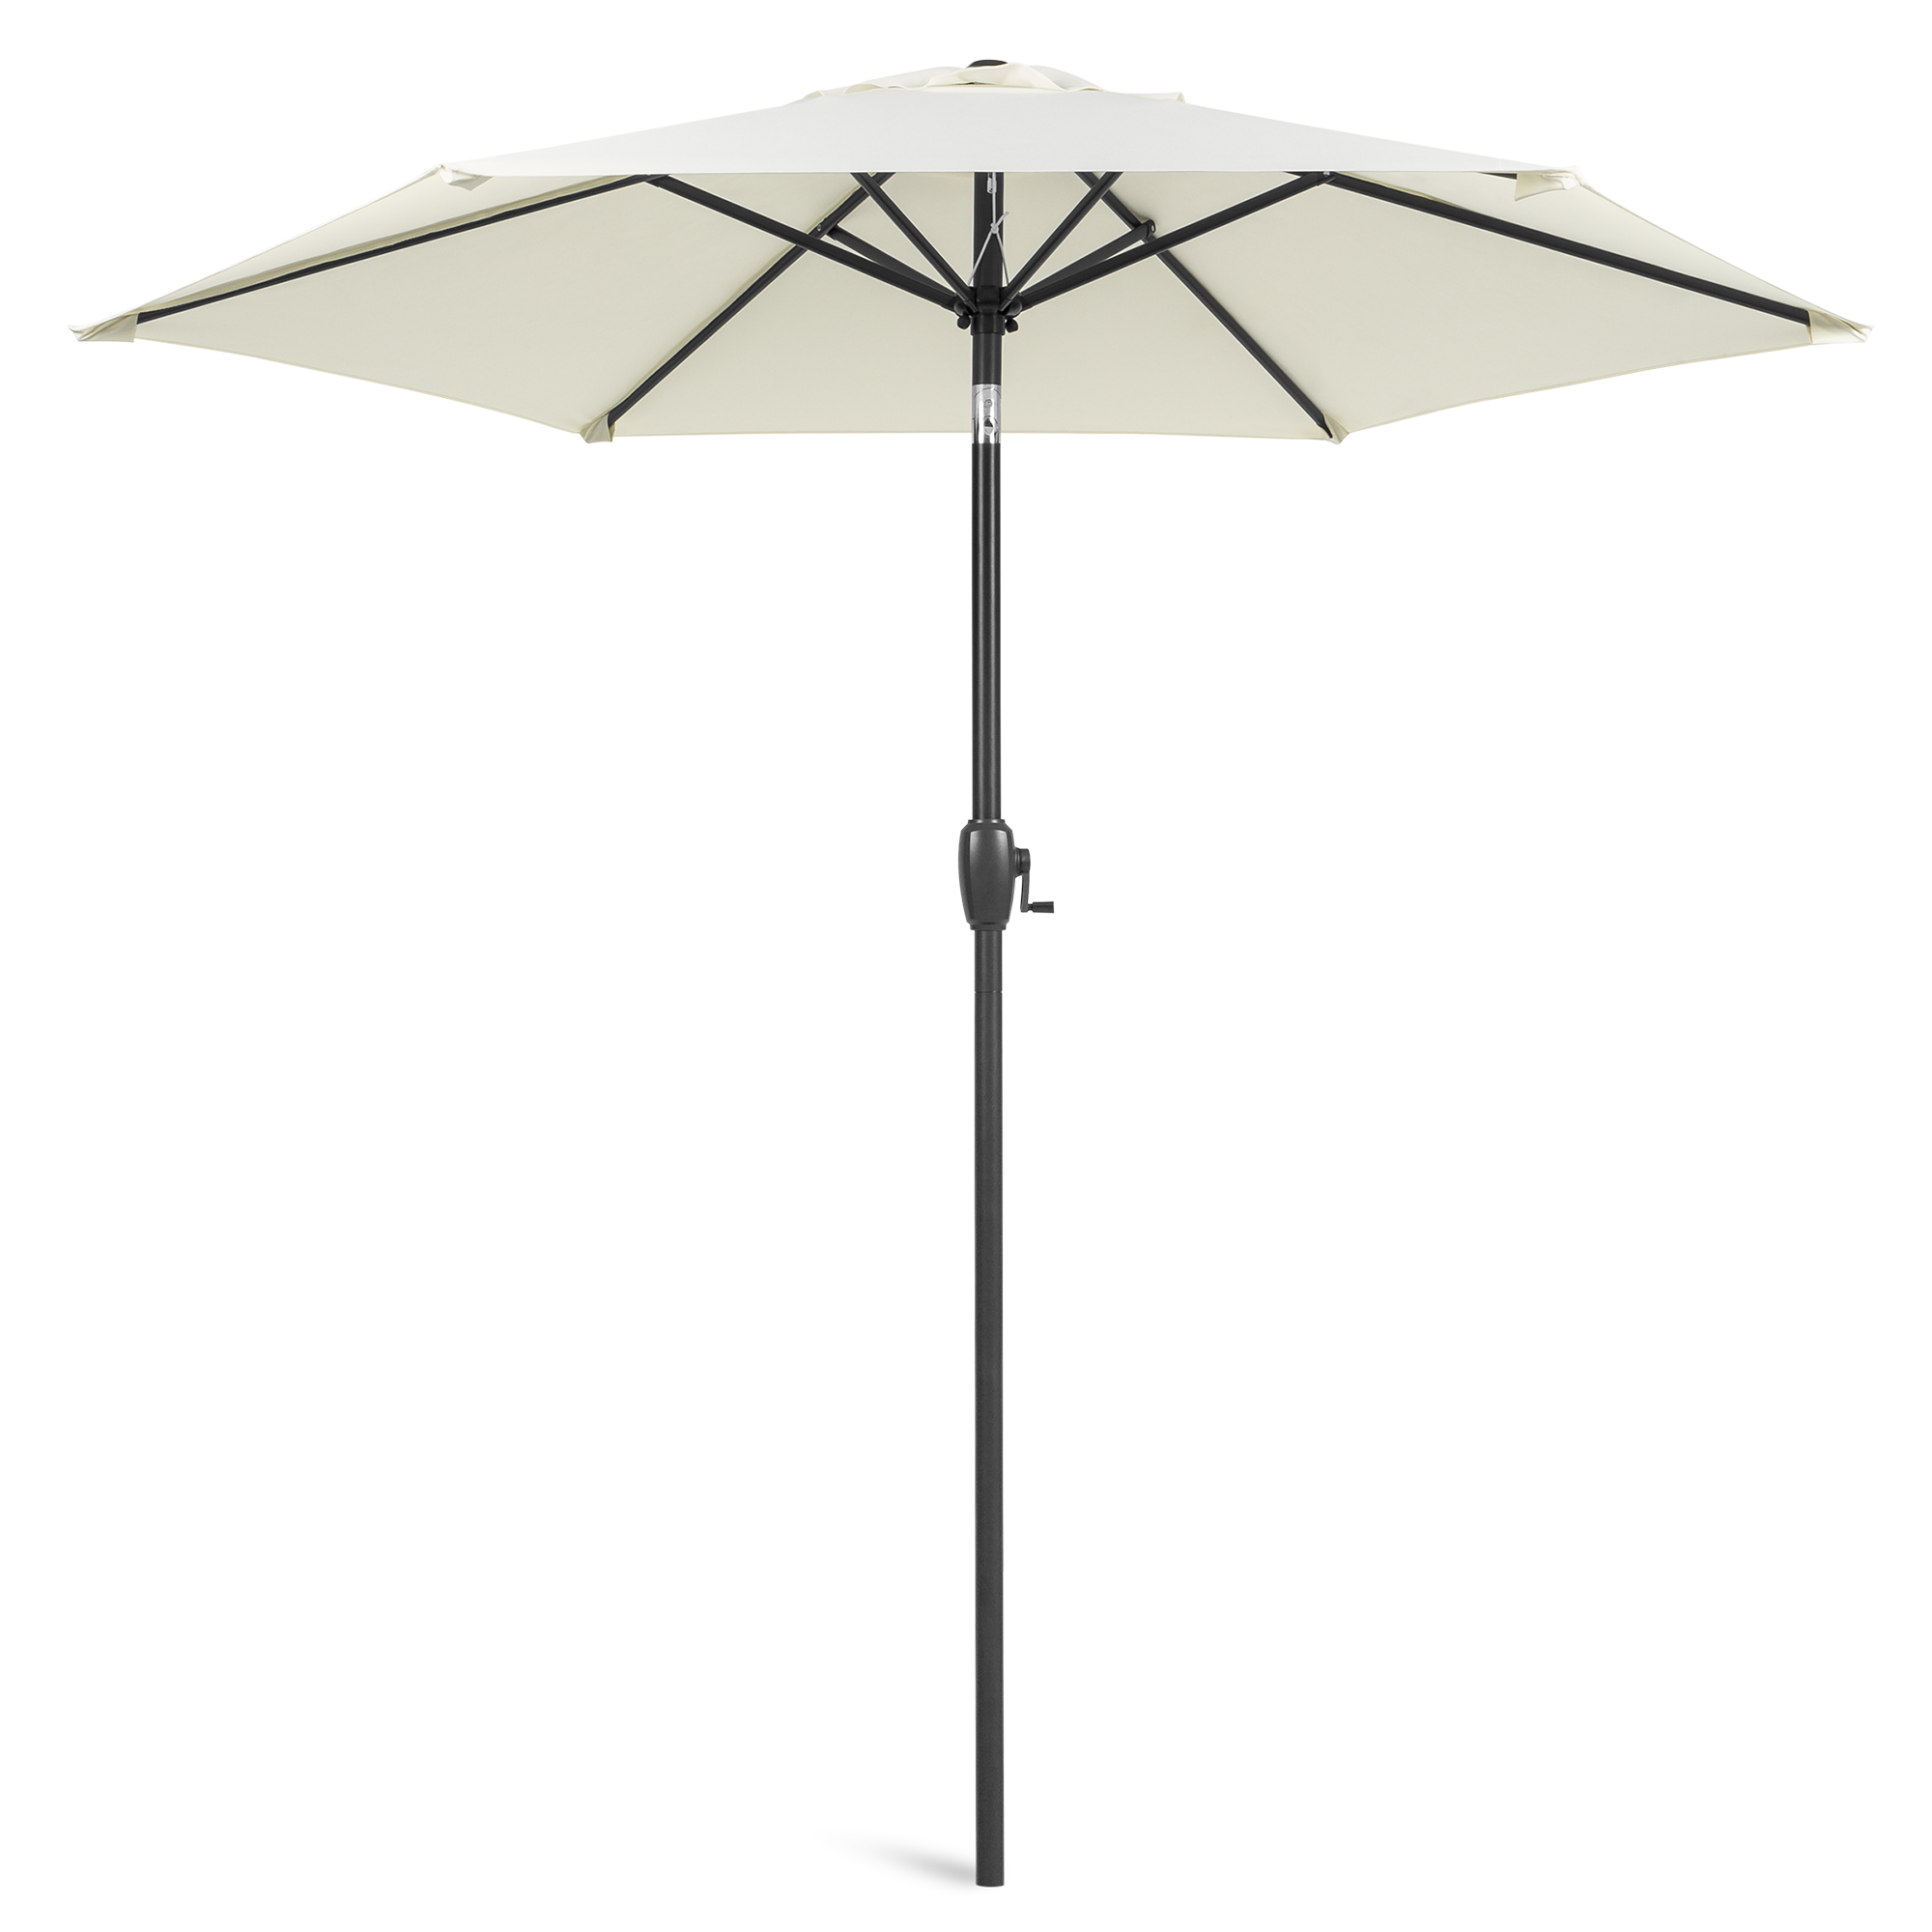 best choice products 7 5ft heavy duty outdoor market patio umbrella w push button tilt easy crank lift cream